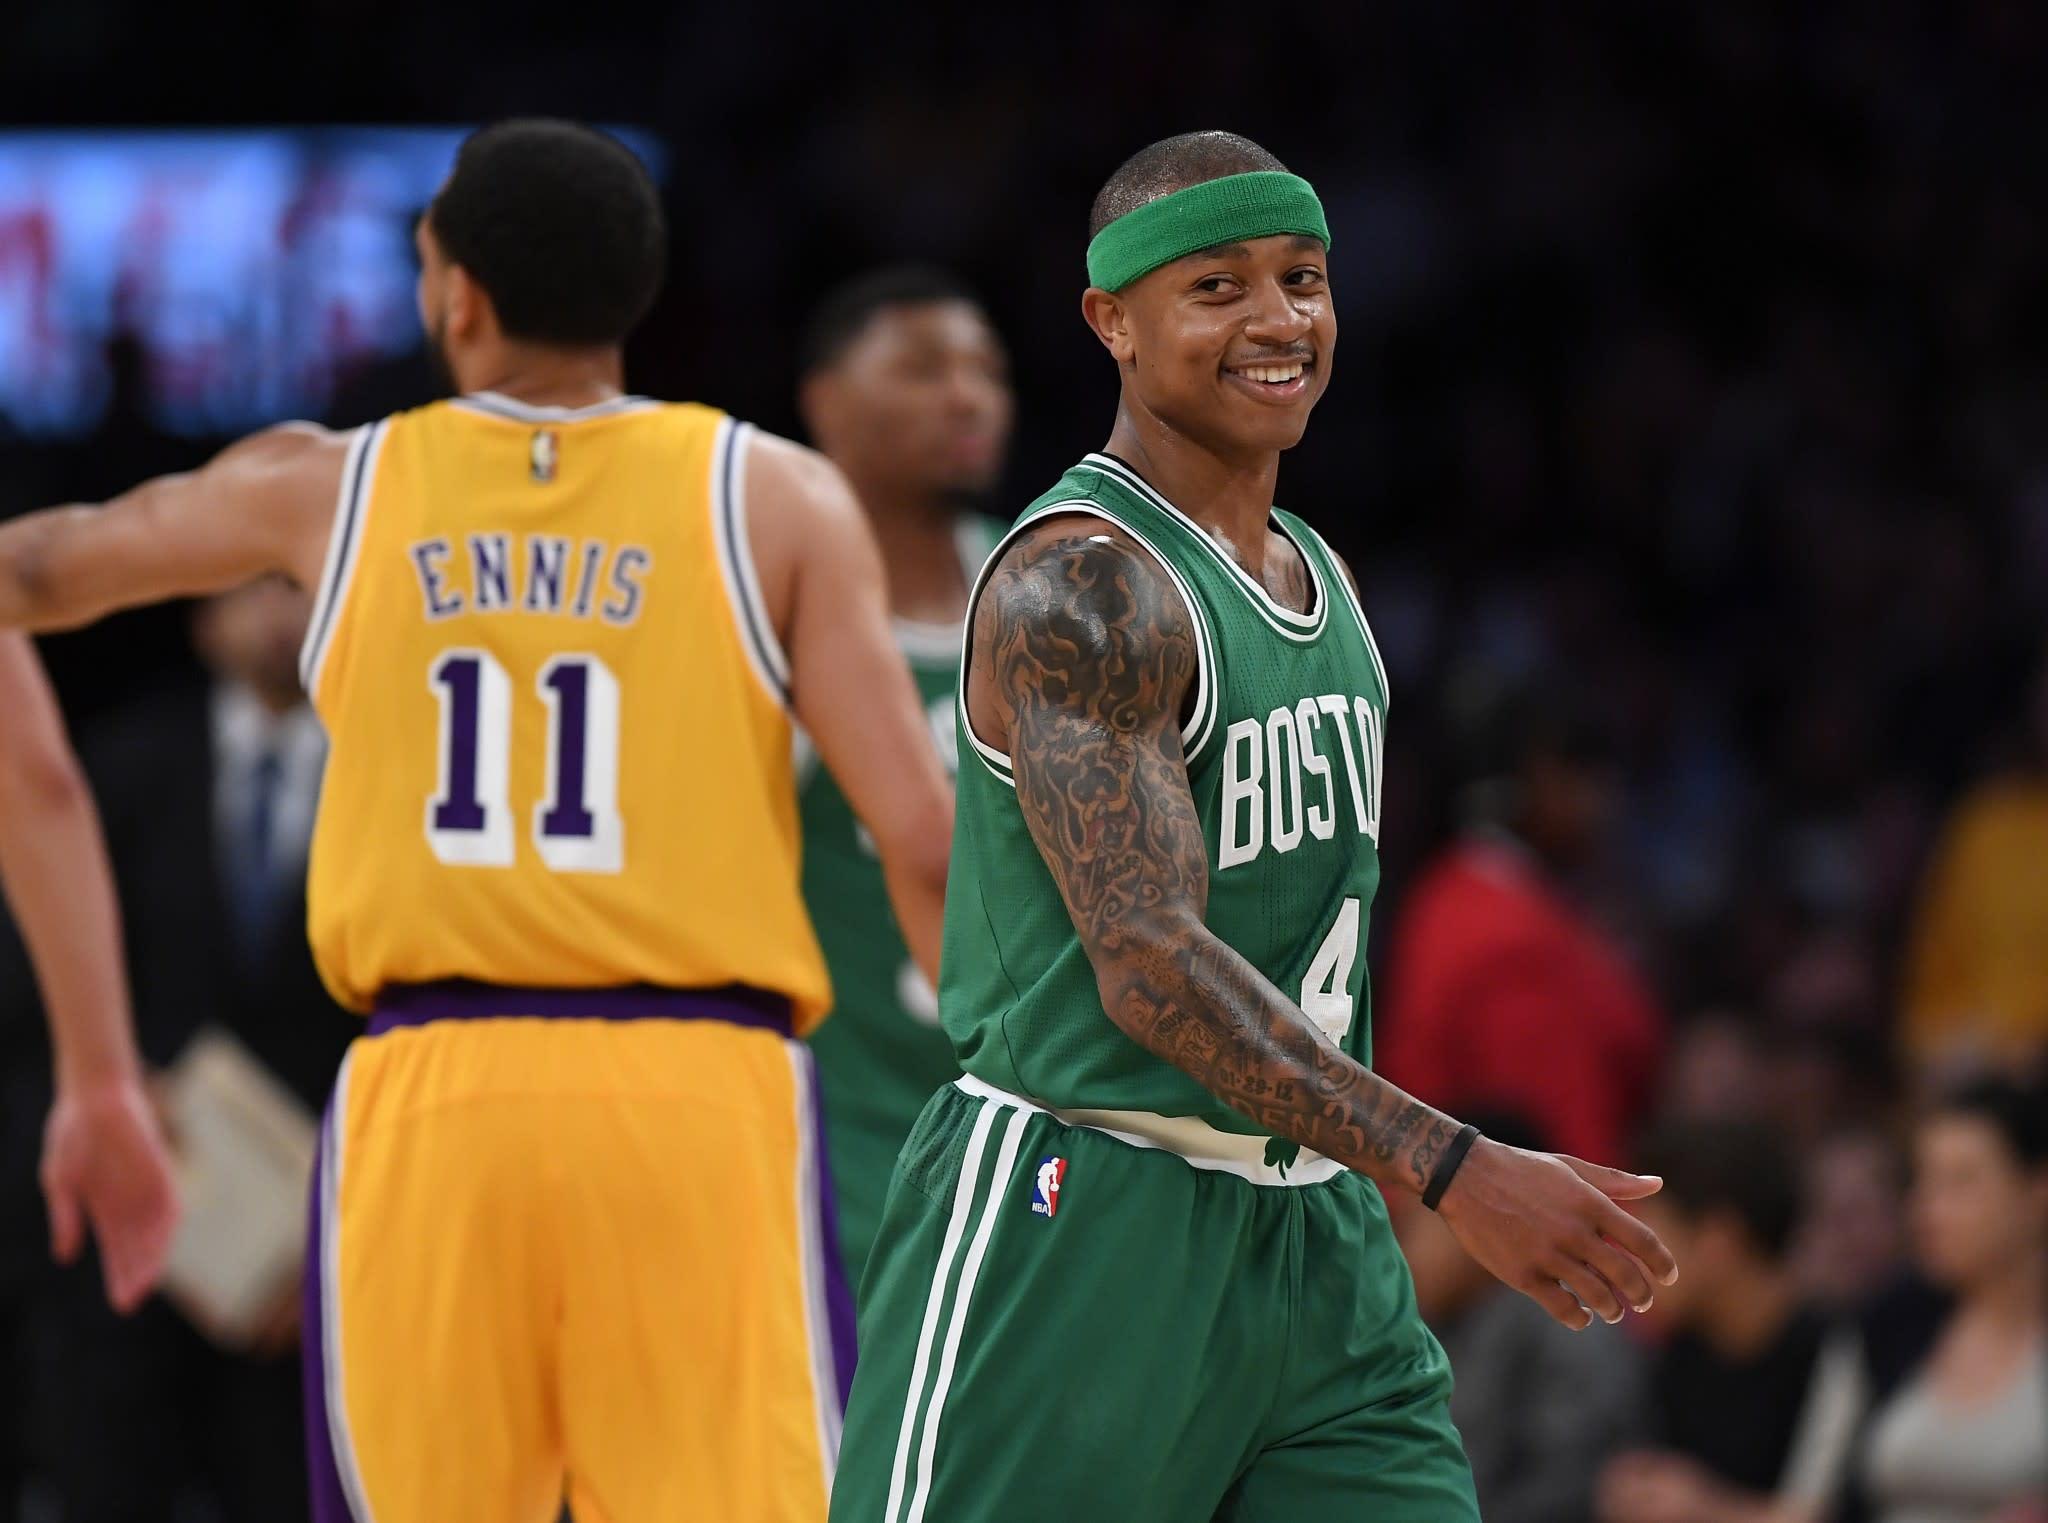 sale retailer 3e8f6 9728e Isaiah Thomas on the Suns shipping him to Boston: 'It's like ...